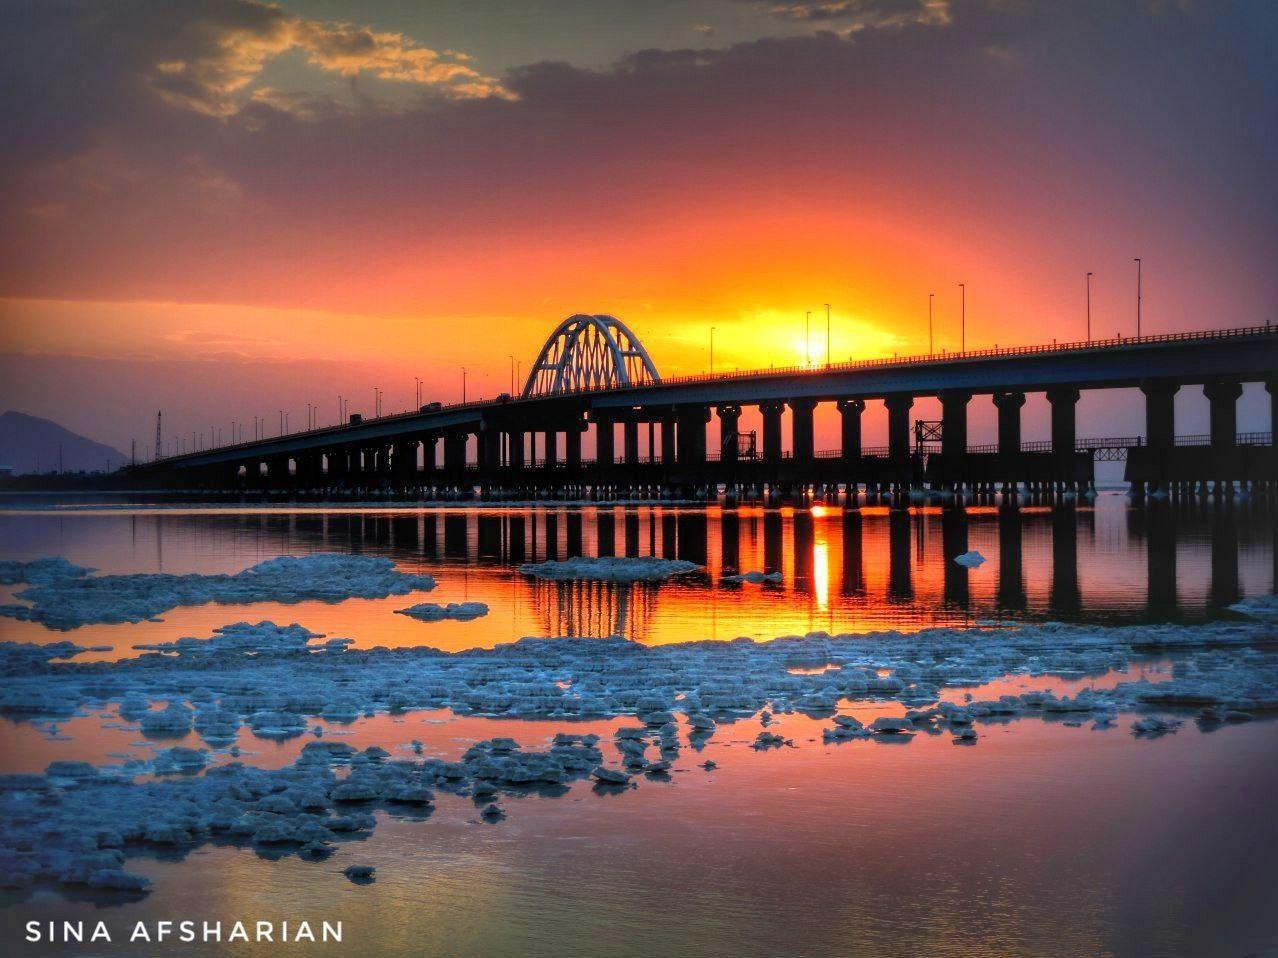 عکس | غروب تماشایی دریاچه ارومیه؛ پل میانگذر